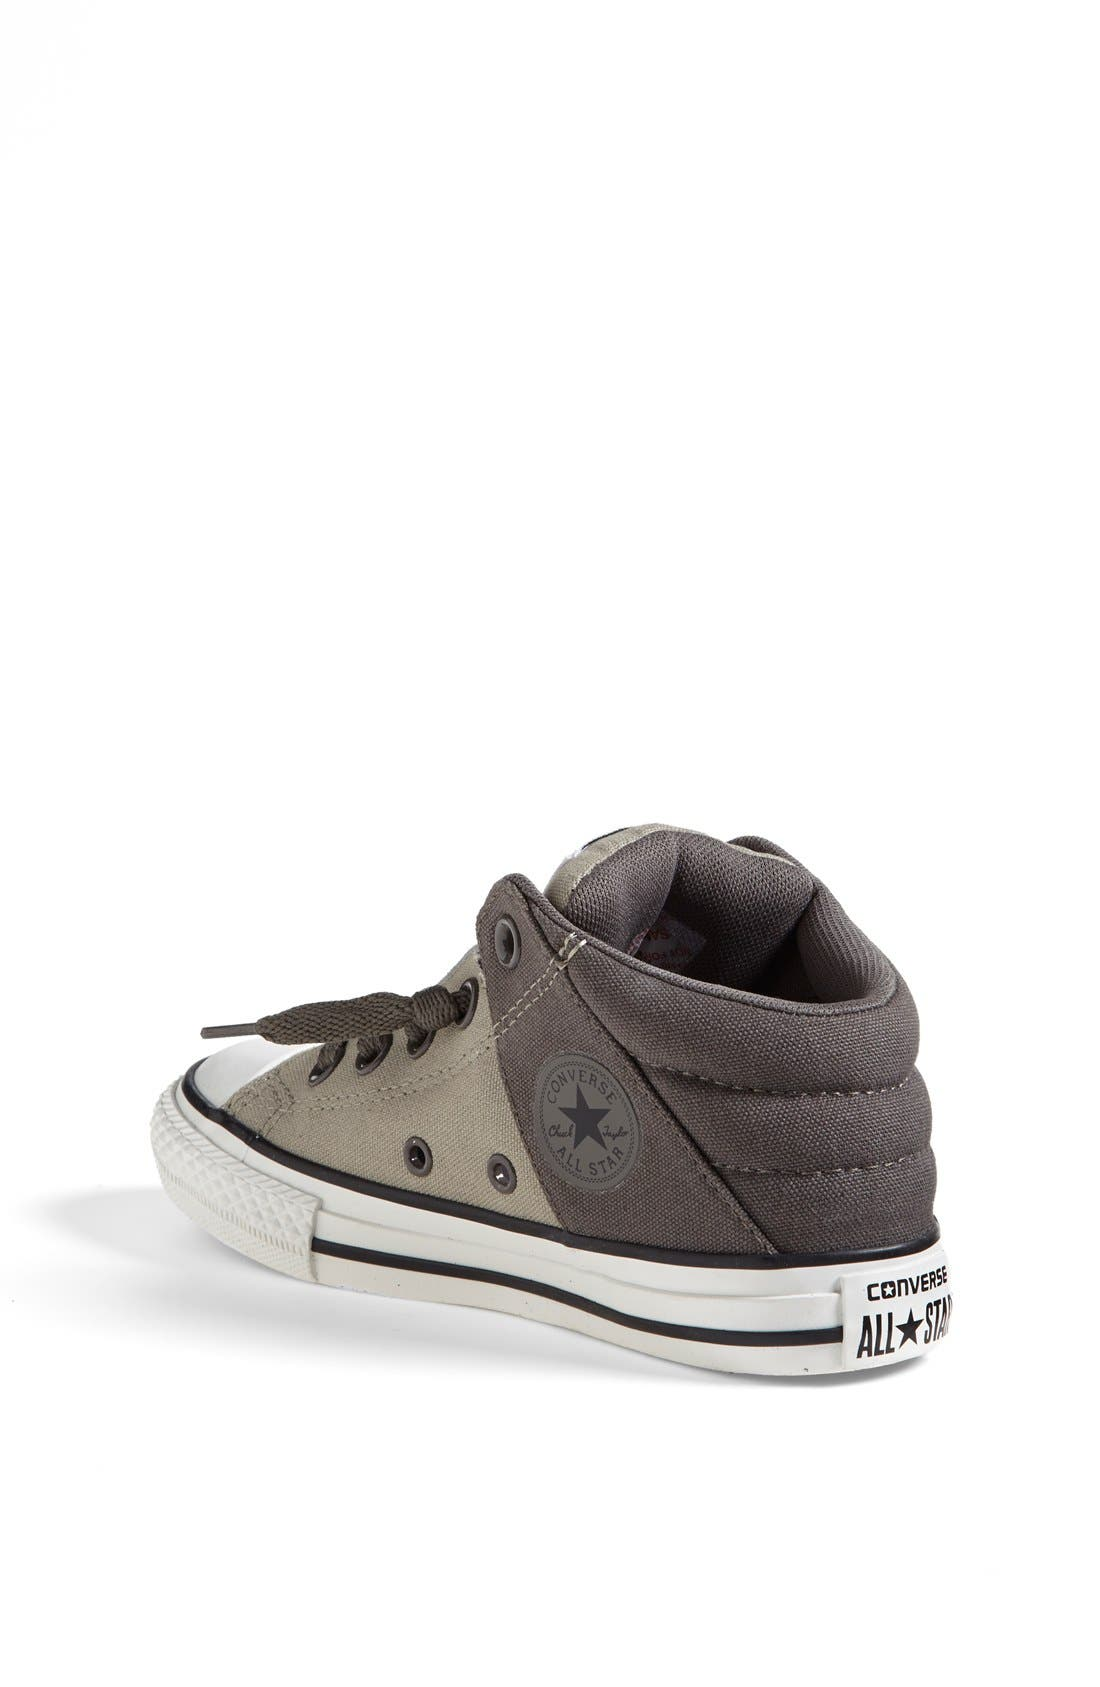 Alternate Image 2  - Converse Chuck Taylor® All-Star® 'Axel' Sneaker (Toddler, Little Kid & Big Kid)